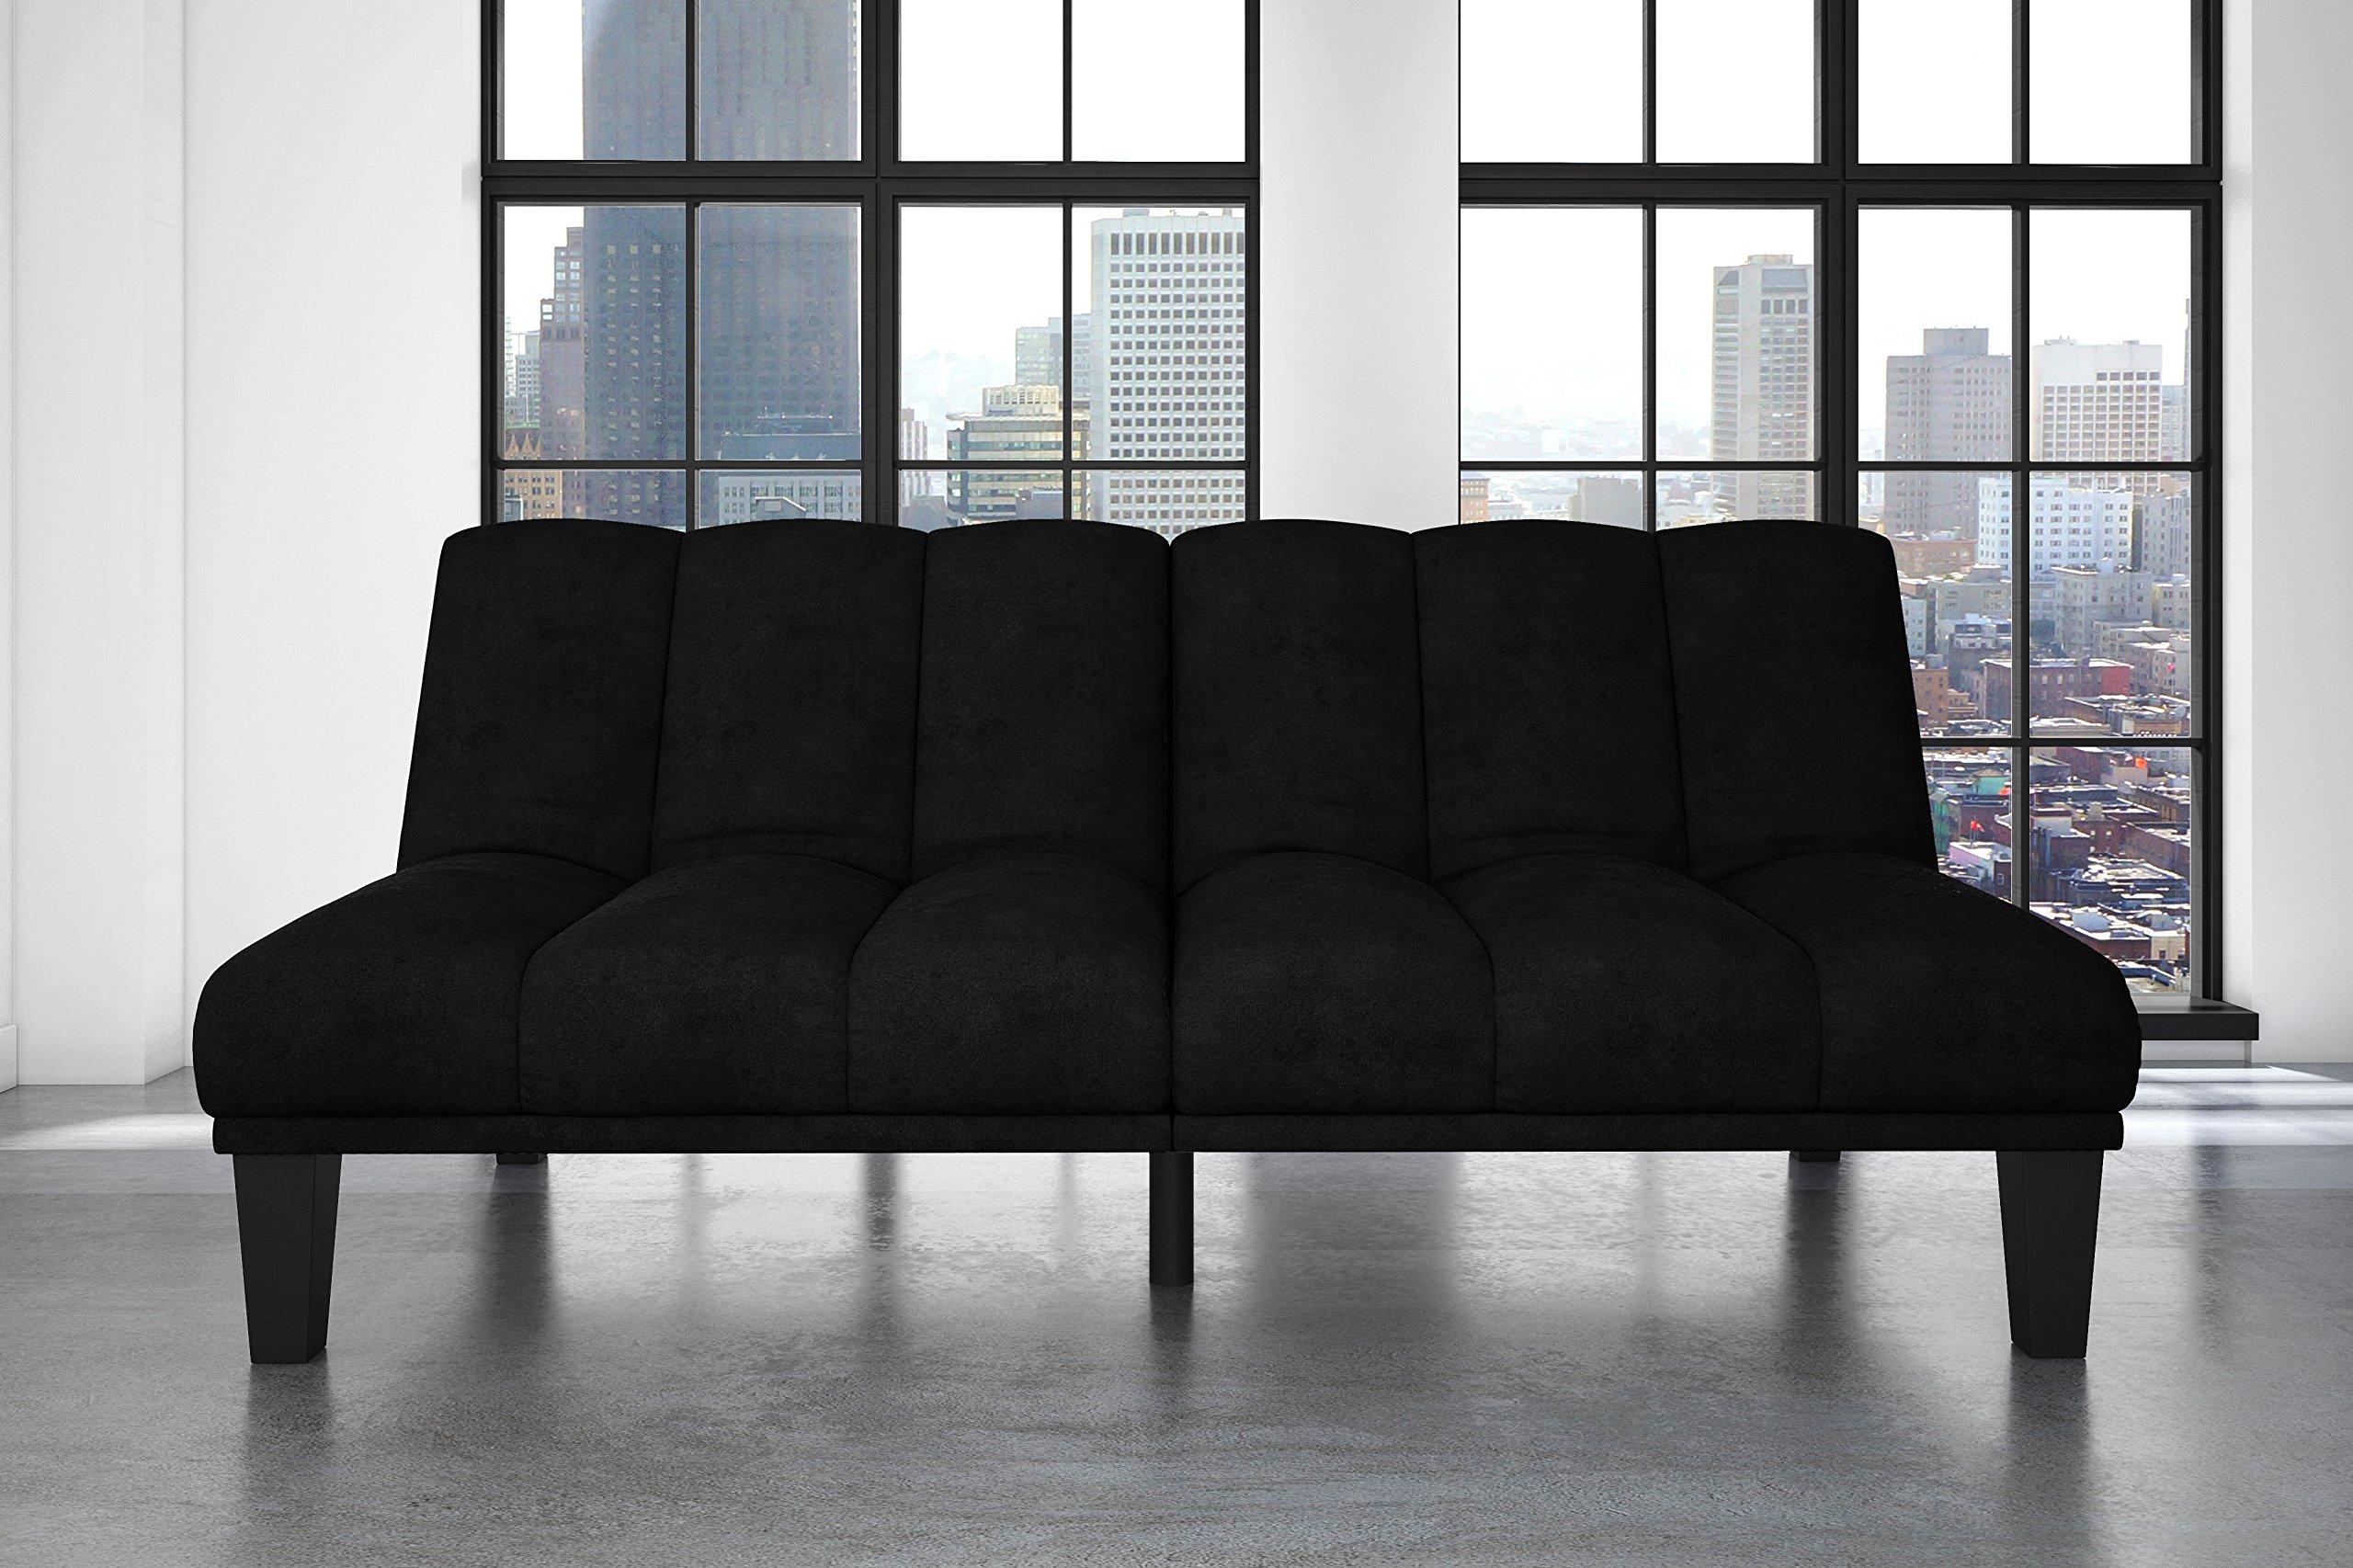 Hamilton Estate Premium Sofa Futon Sleeper Comfortable Plush Upholstery, Rich Black by DHP (Image #3)